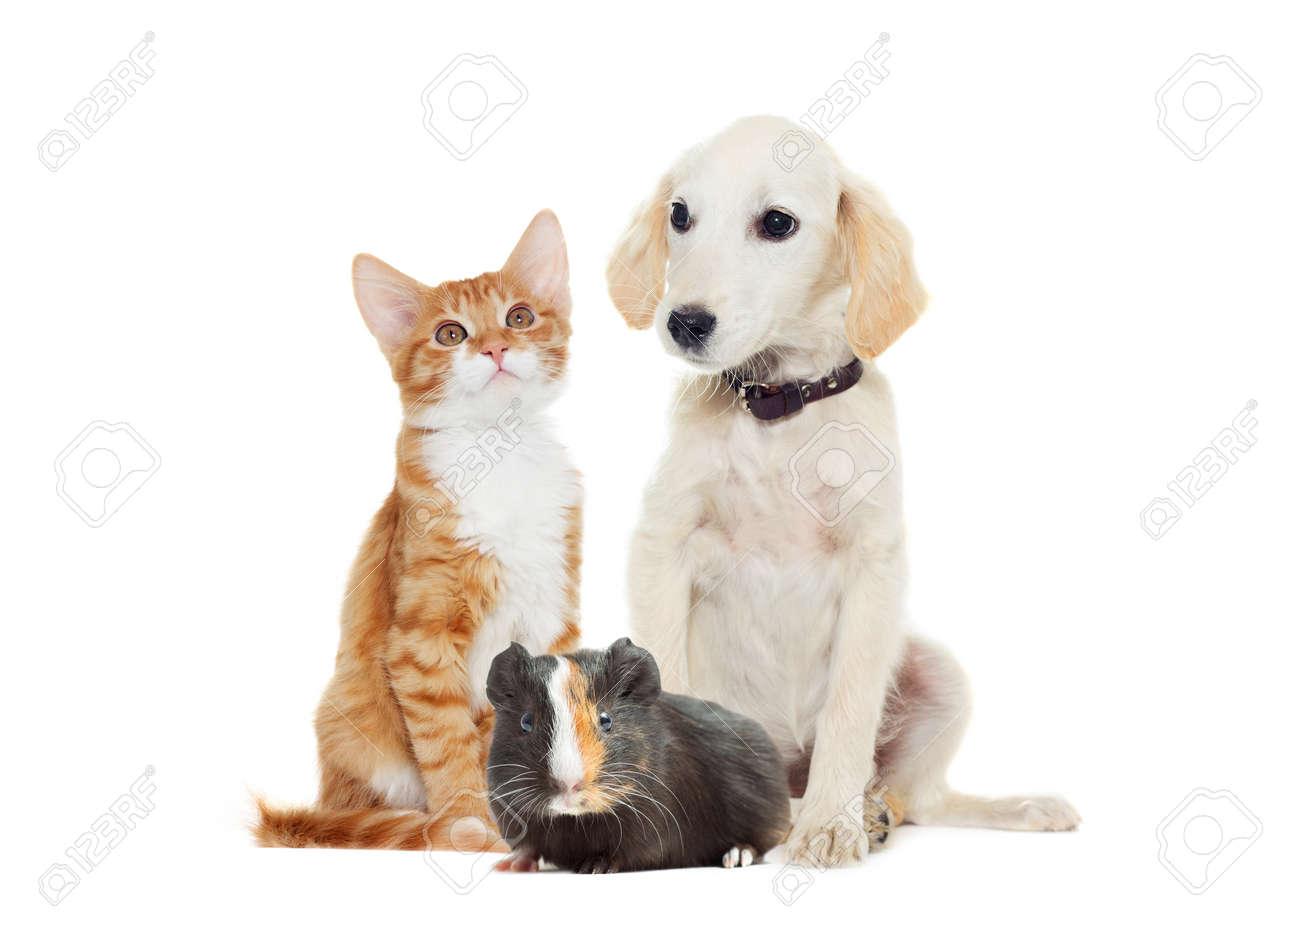 Set pets looking - 50880698